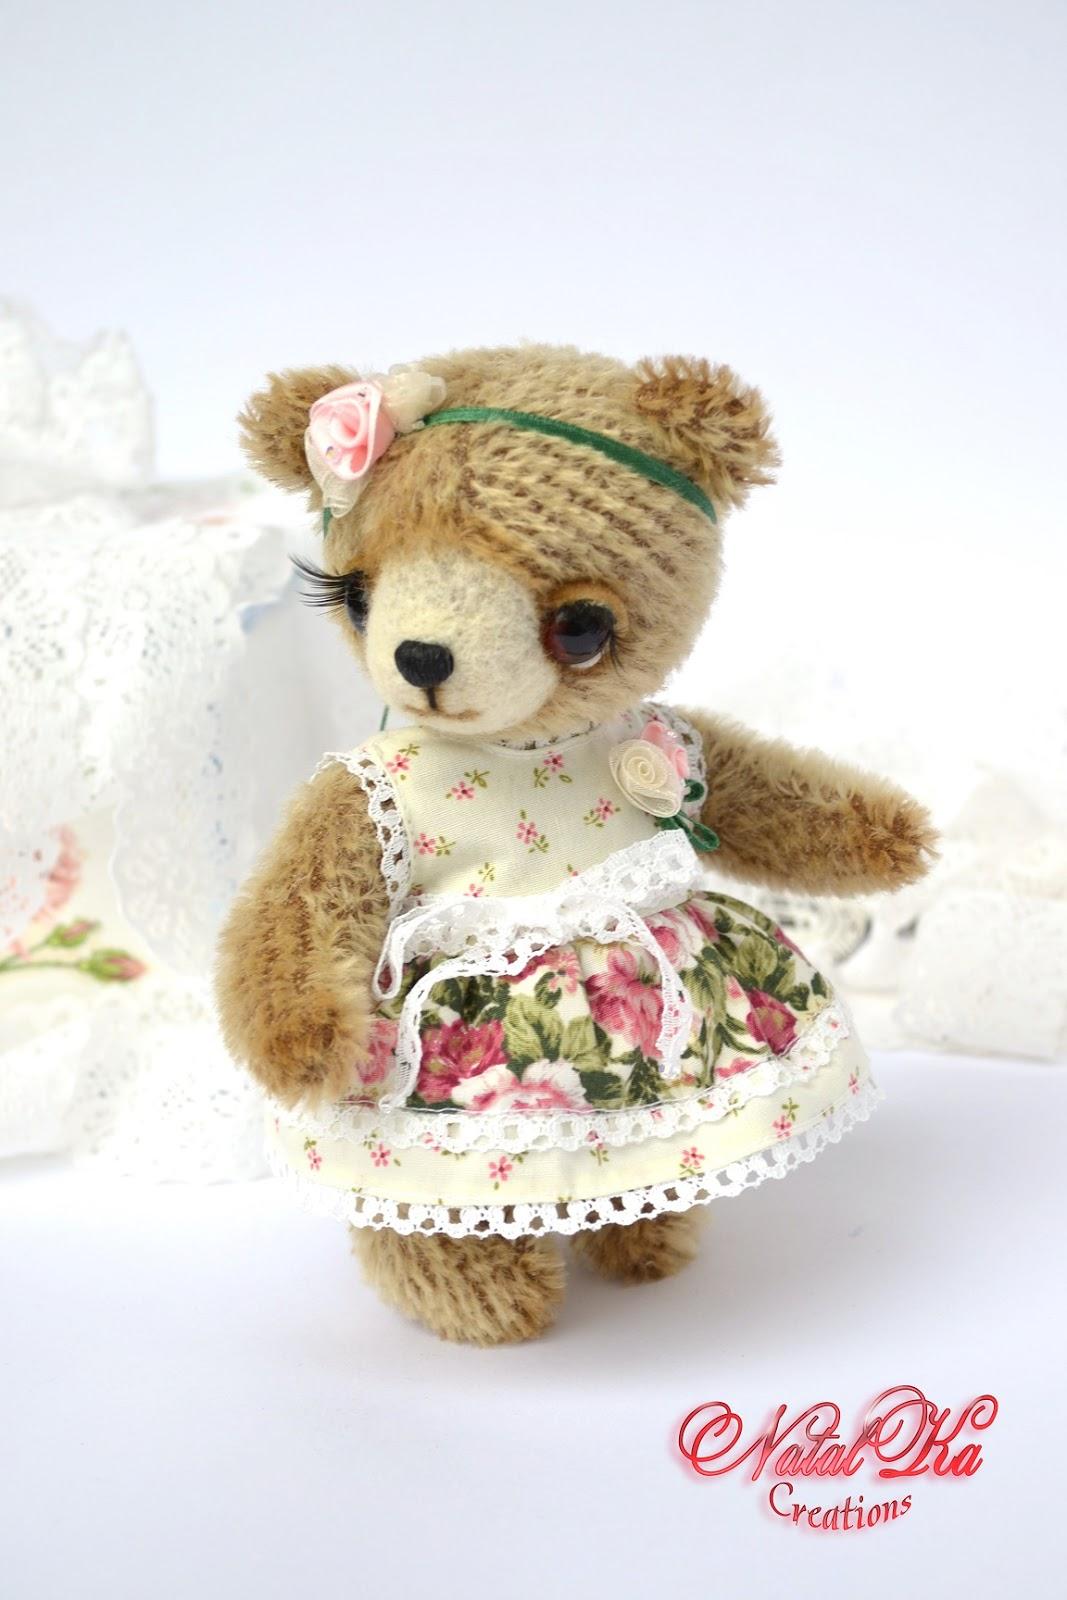 Künstler Teddybär aus Mohair handgemacht von NatalKa Creations. Artist teddy bear from mohair handmade by NatalKa Creations.